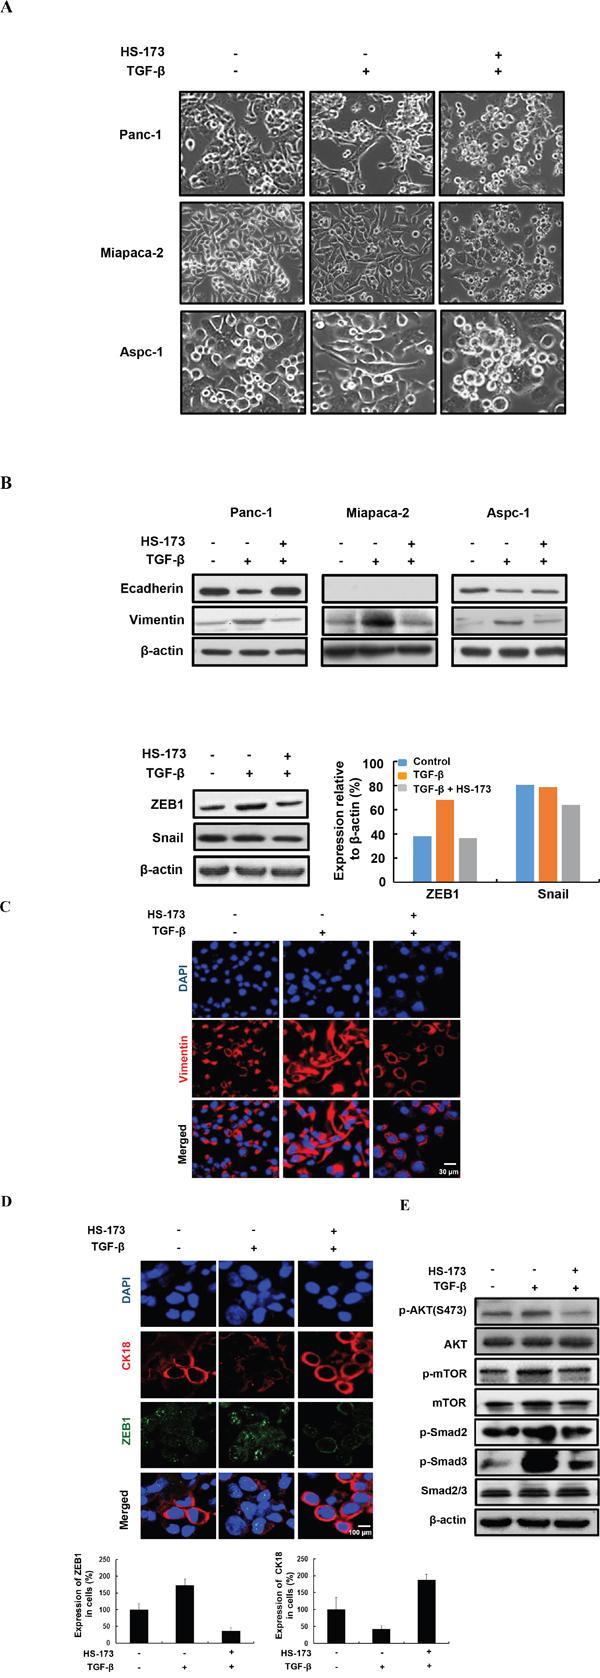 HS-173 inhibited TGF-β-induced EMT in vitro.